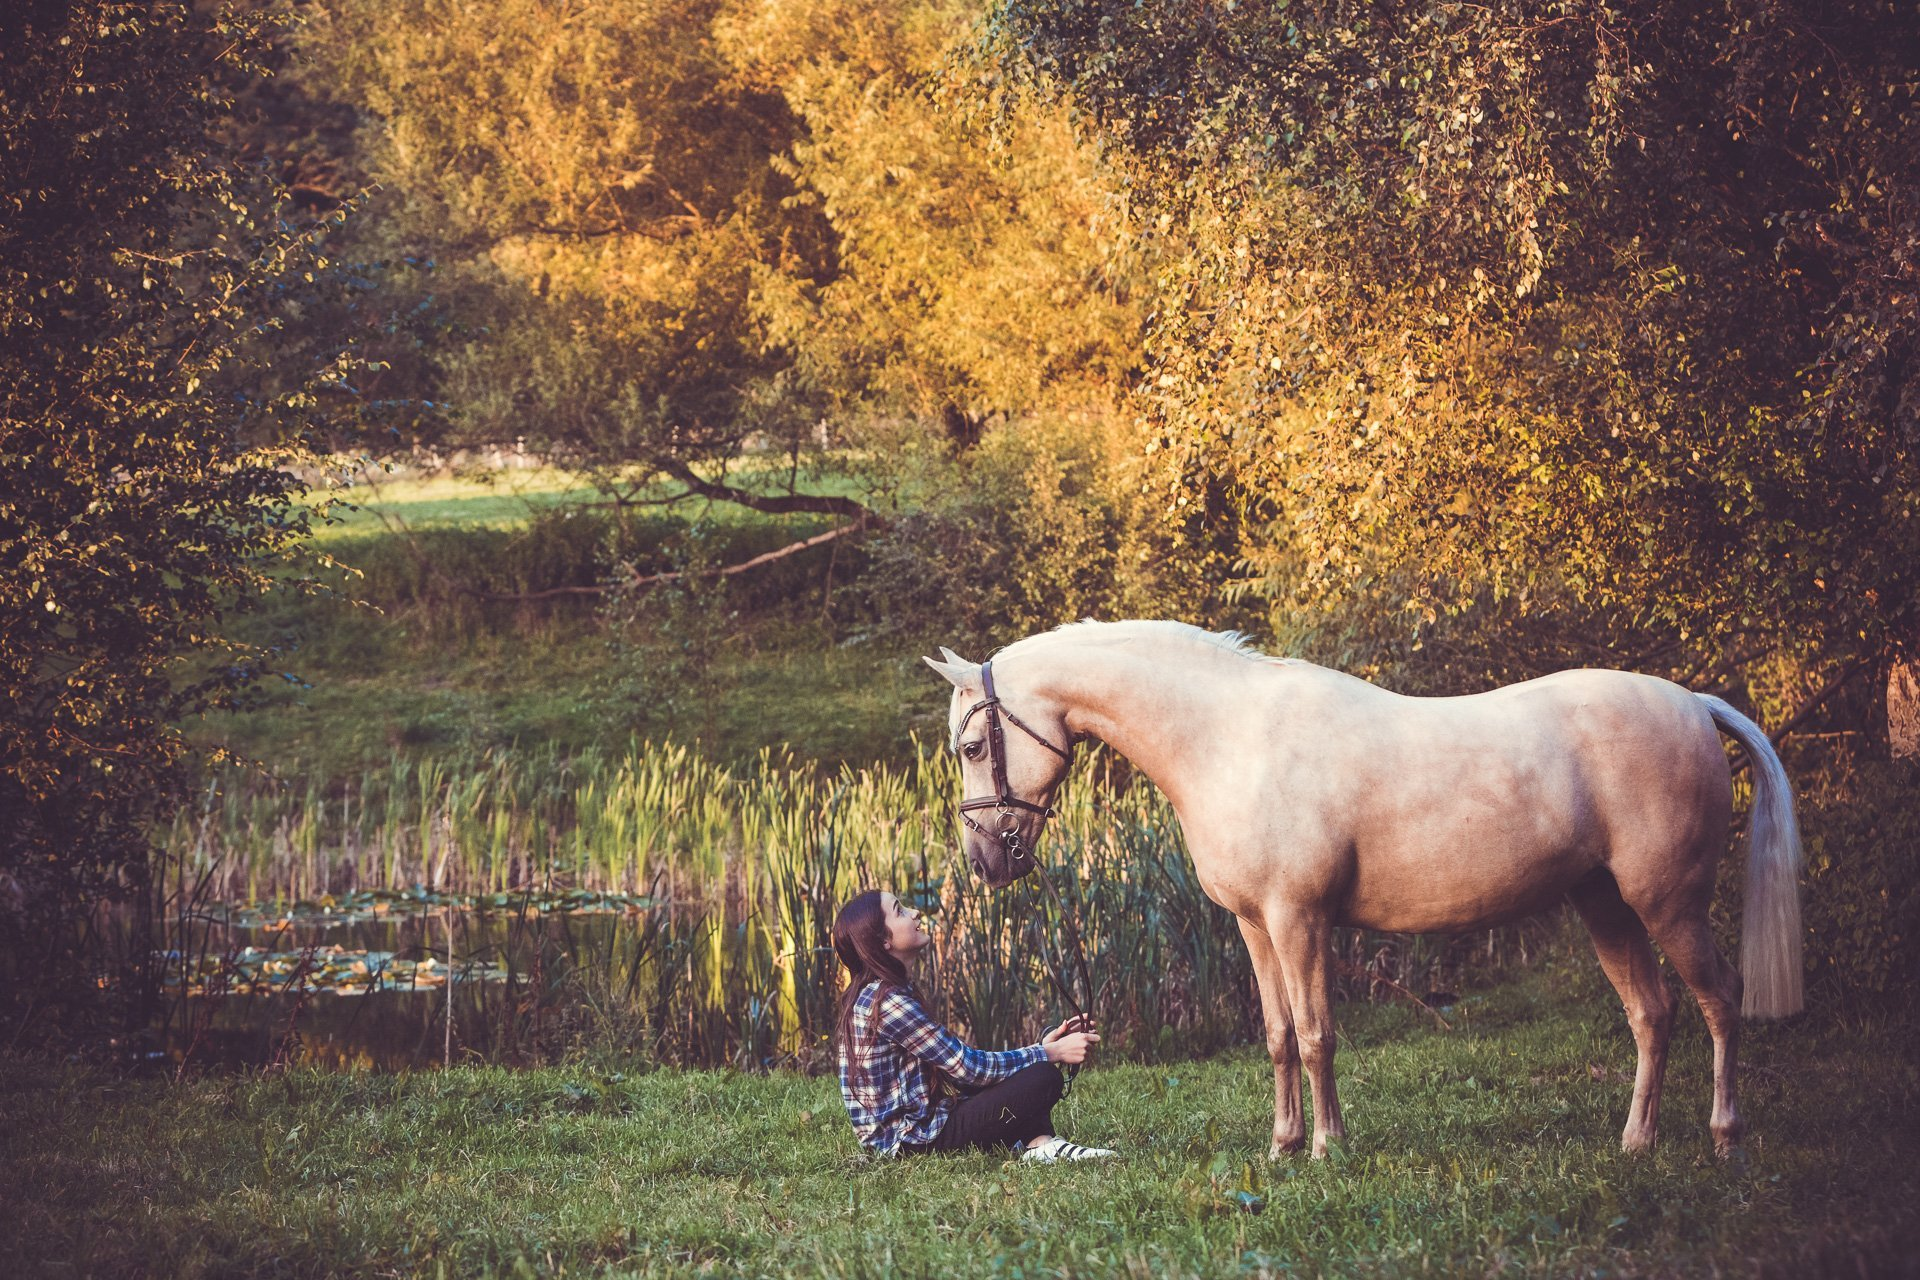 Scarlett's Horse & Rider Photo Shoot